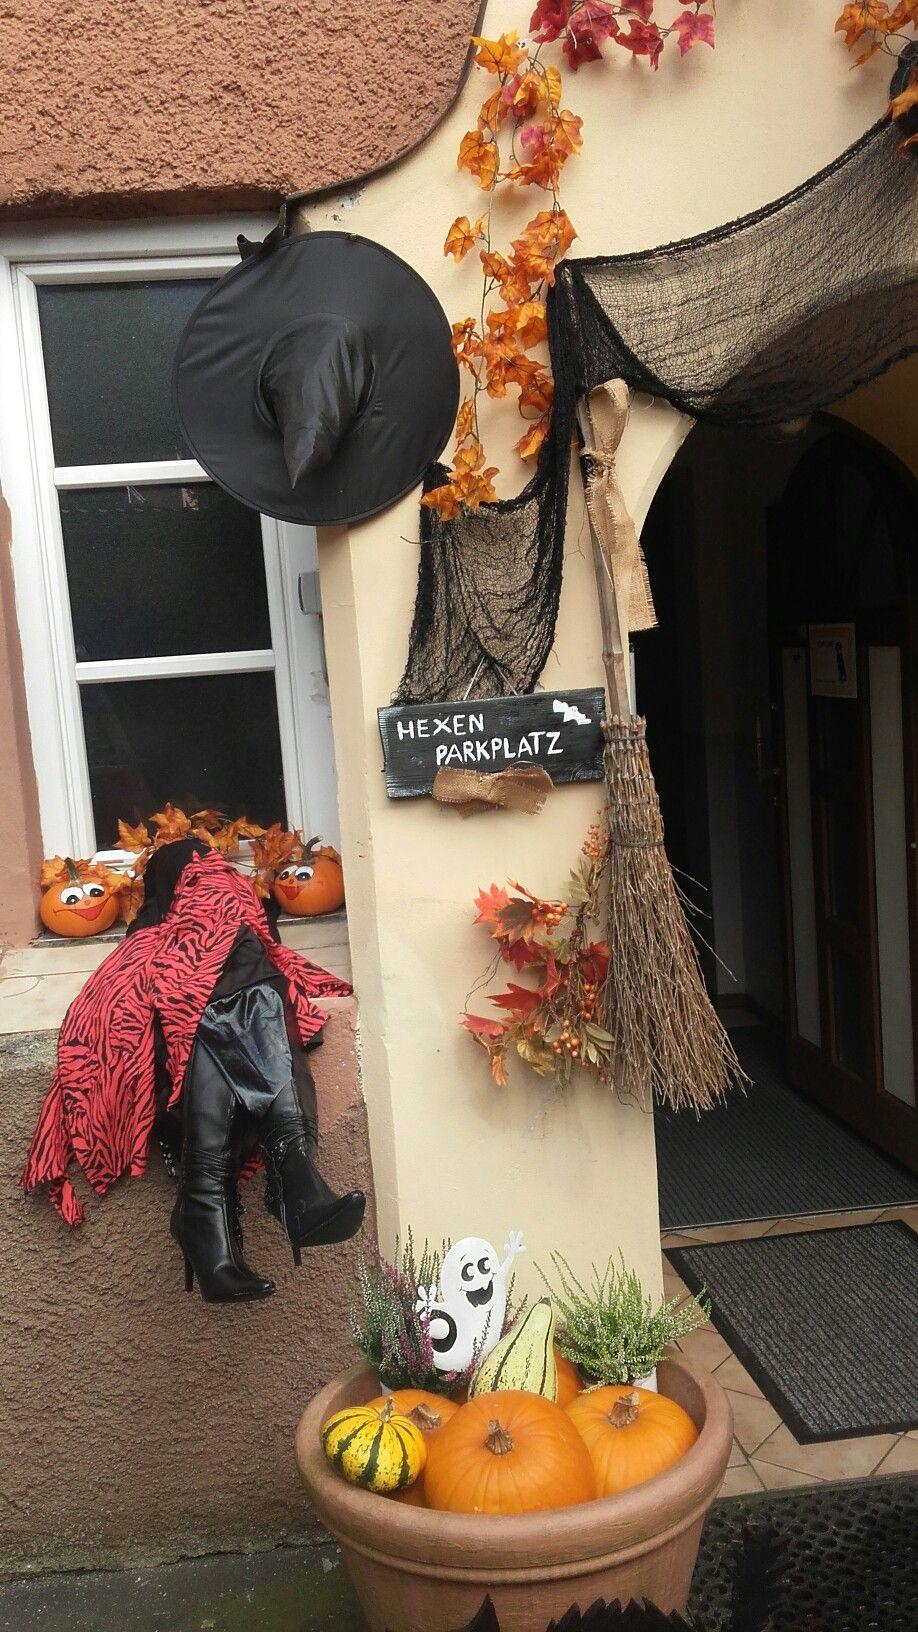 Herbst Halloween deko Hauseingang